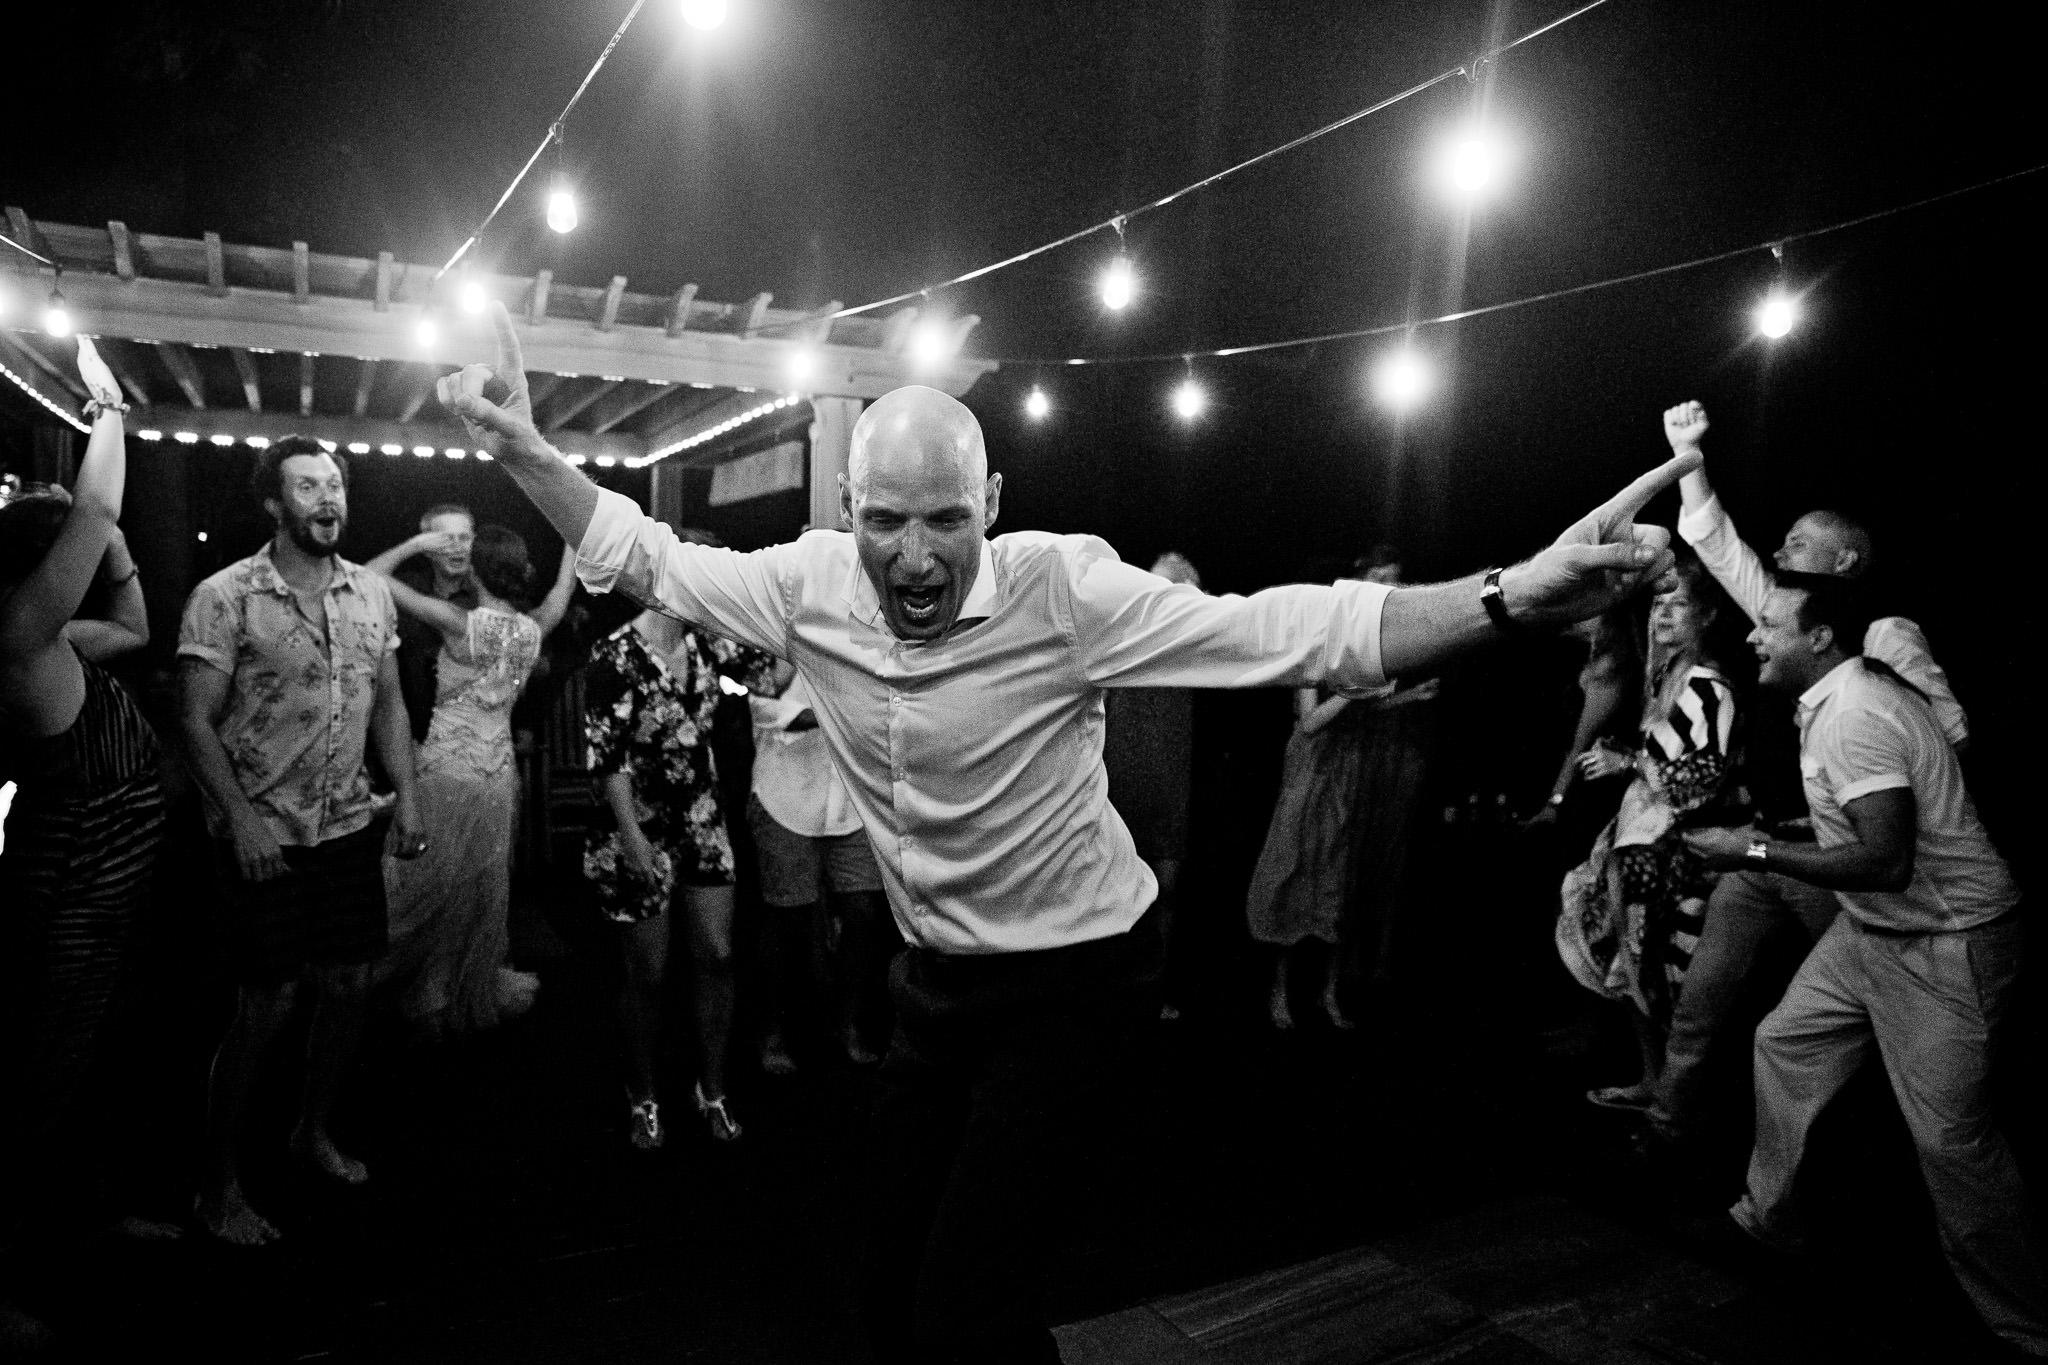 068_Canadian-destination-wedding-photogr